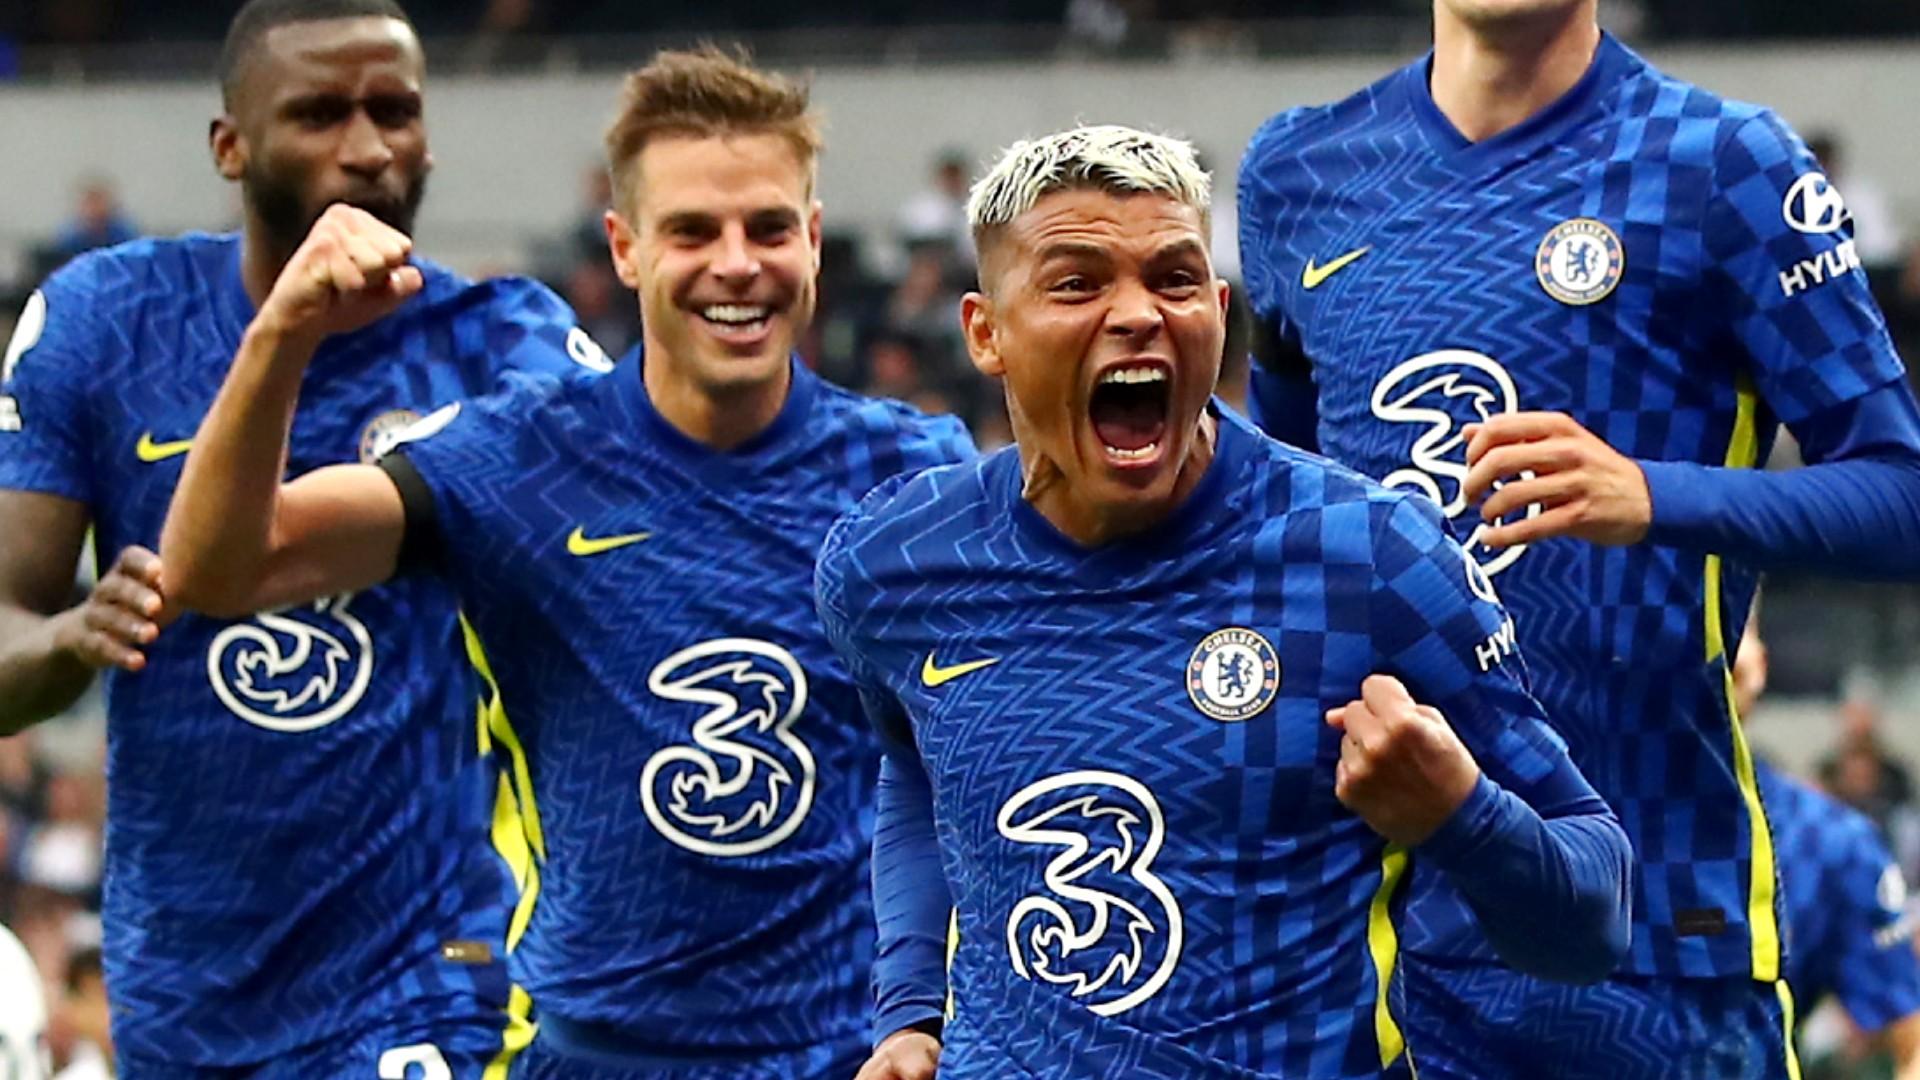 Tottenham vs. Chelsea result: Thiago Silva, N'Golo Kante and Antonio Rudiger score in London derby win